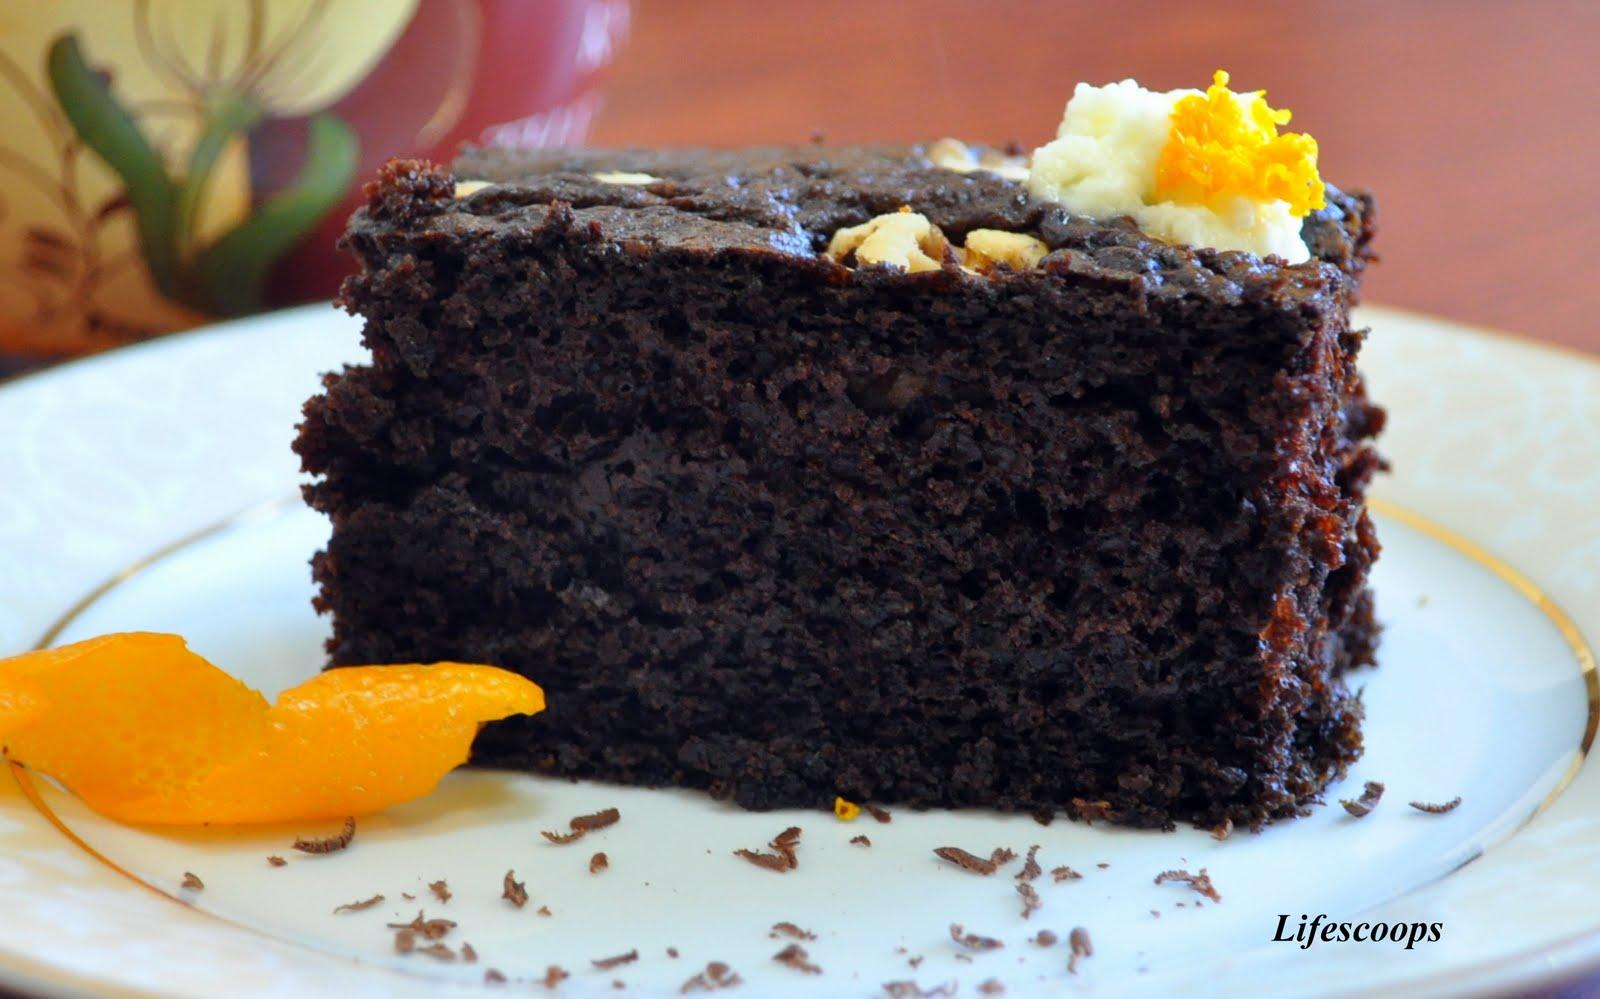 Life Scoops Chocolate Orange Cake